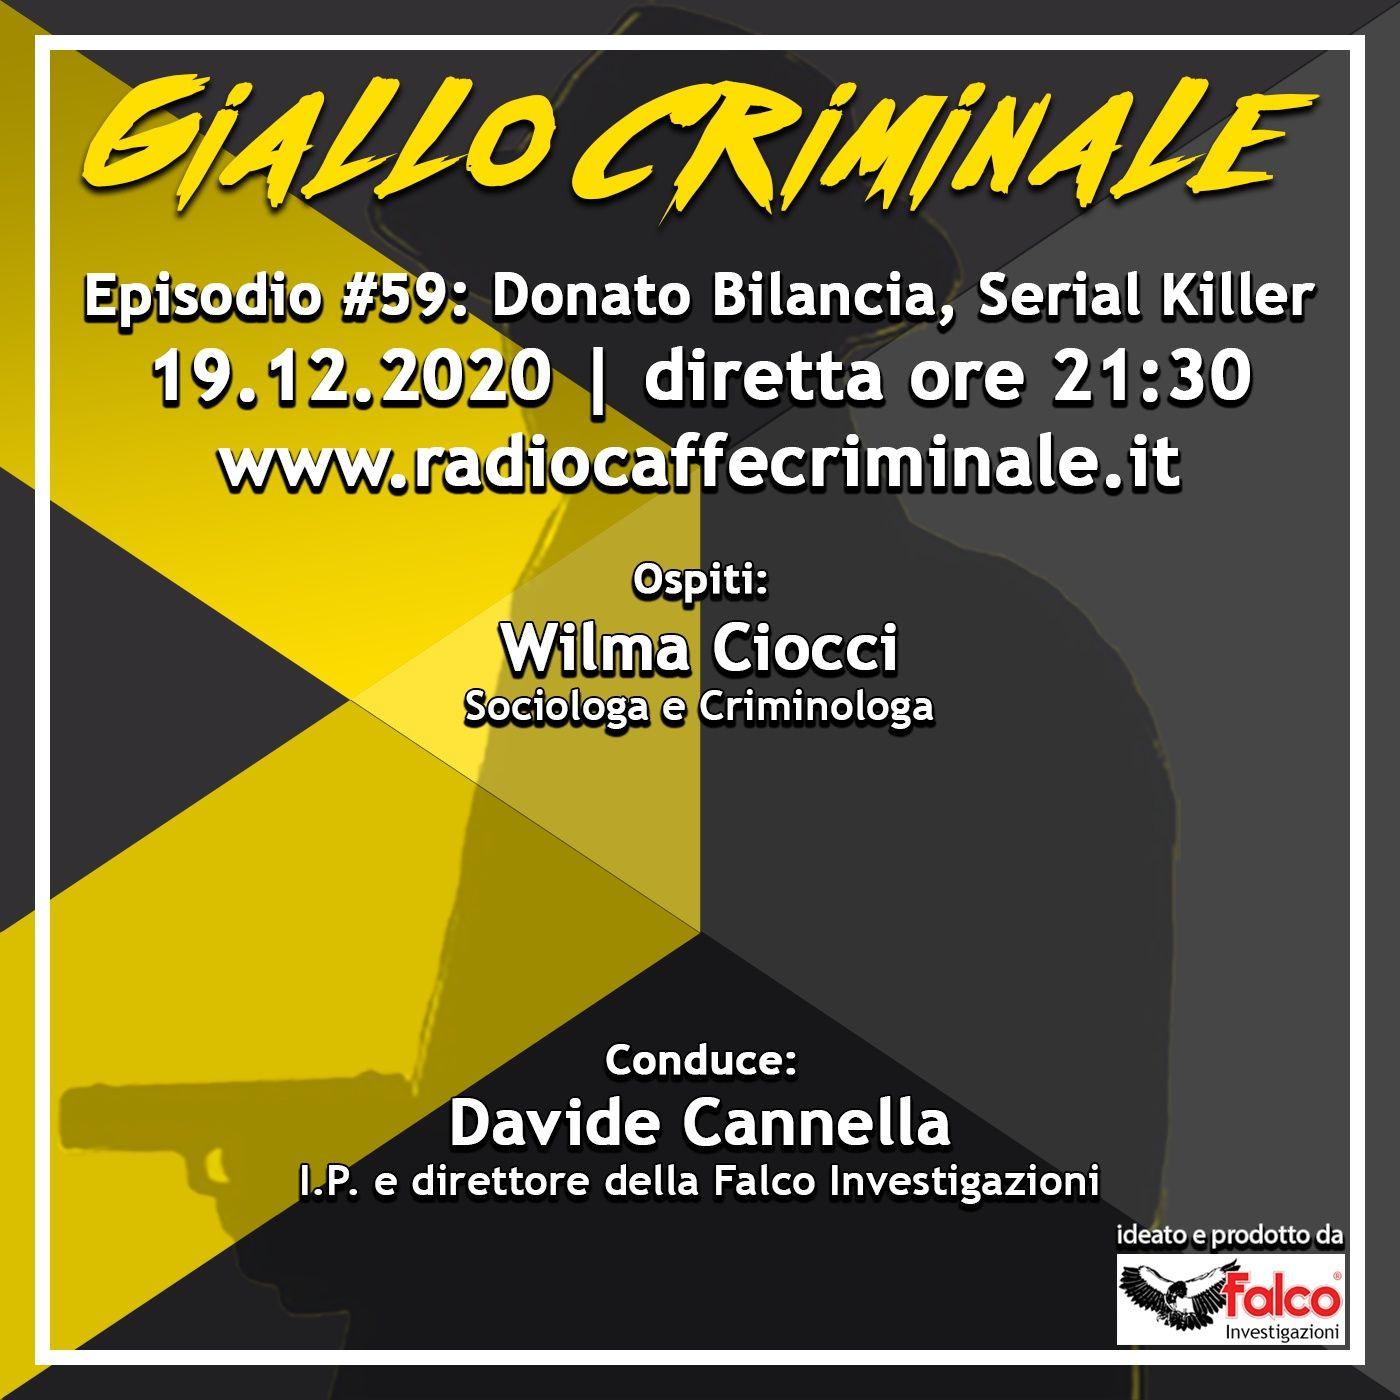 #59 Ep. | Donato Bilancia, Serial Killer